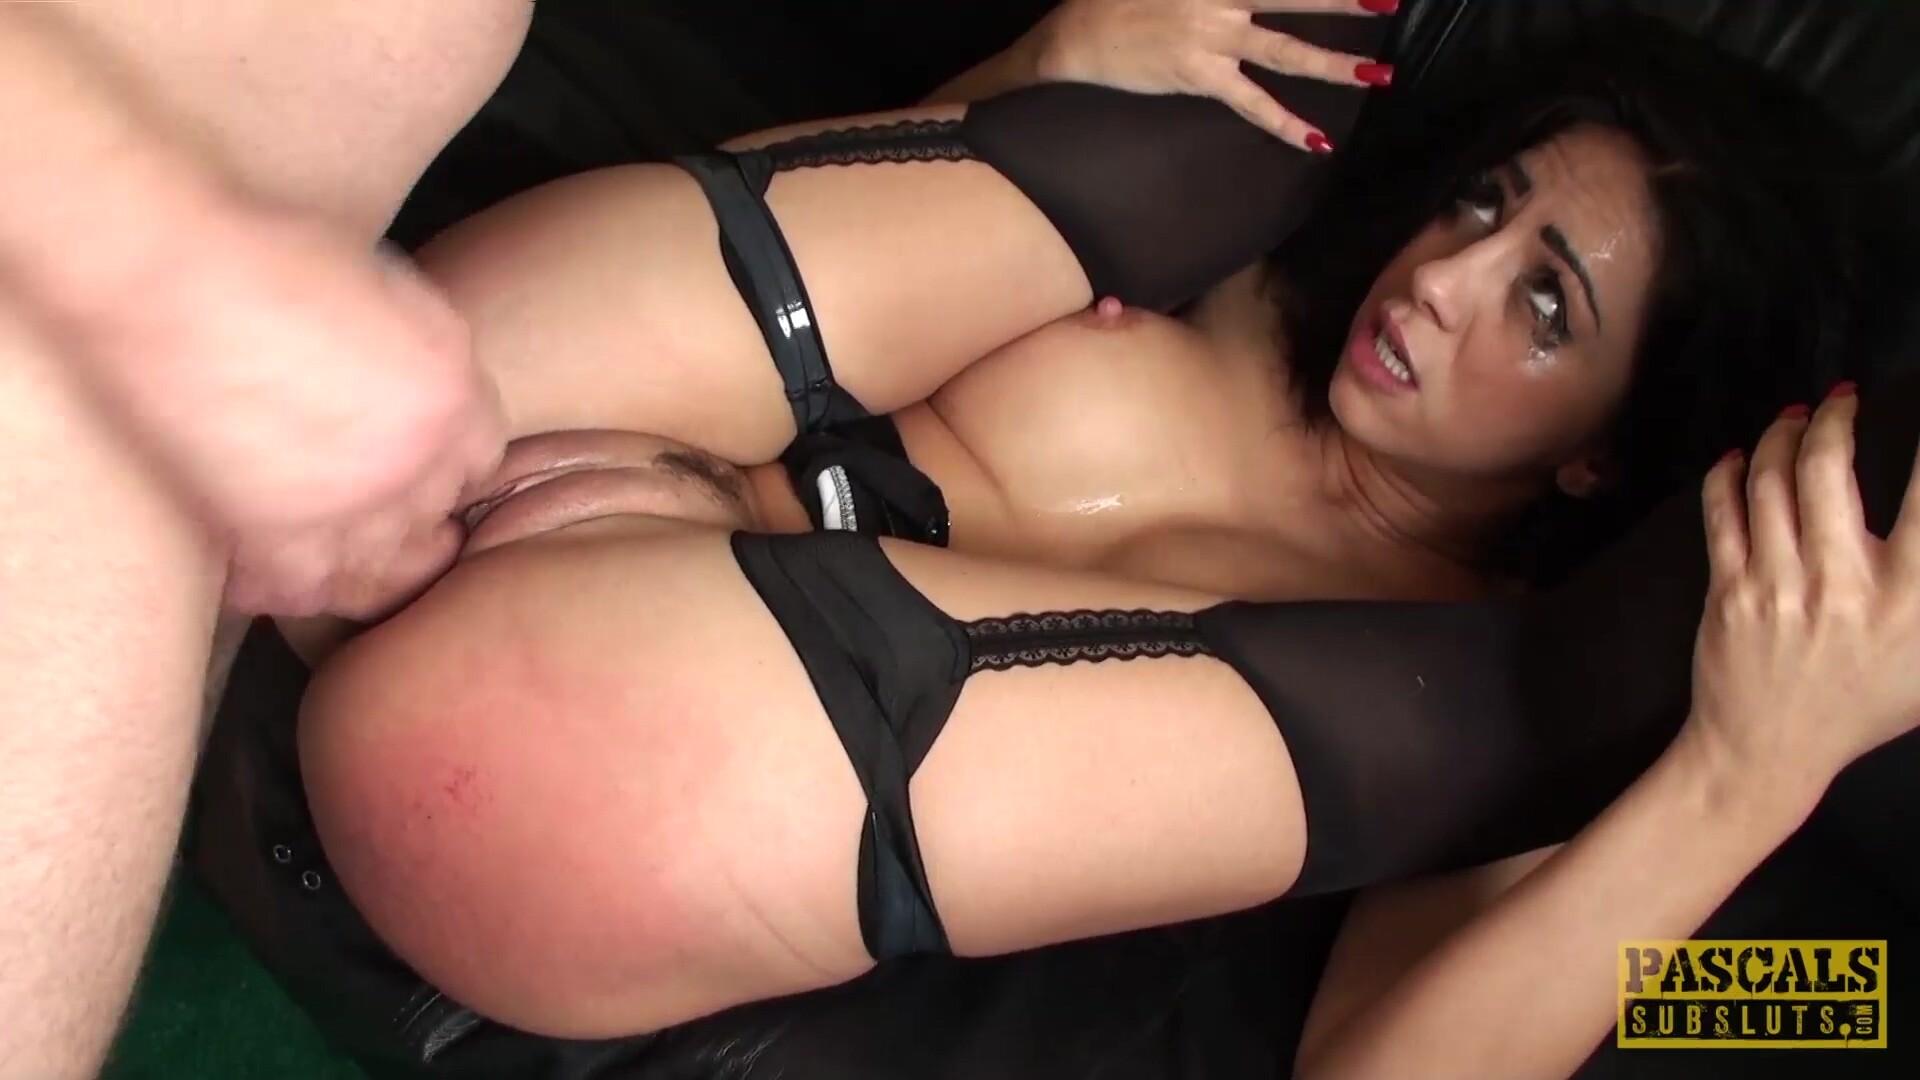 PASCALSSUBSLUTS - Submissive Latina Julia de Lucia Dominated